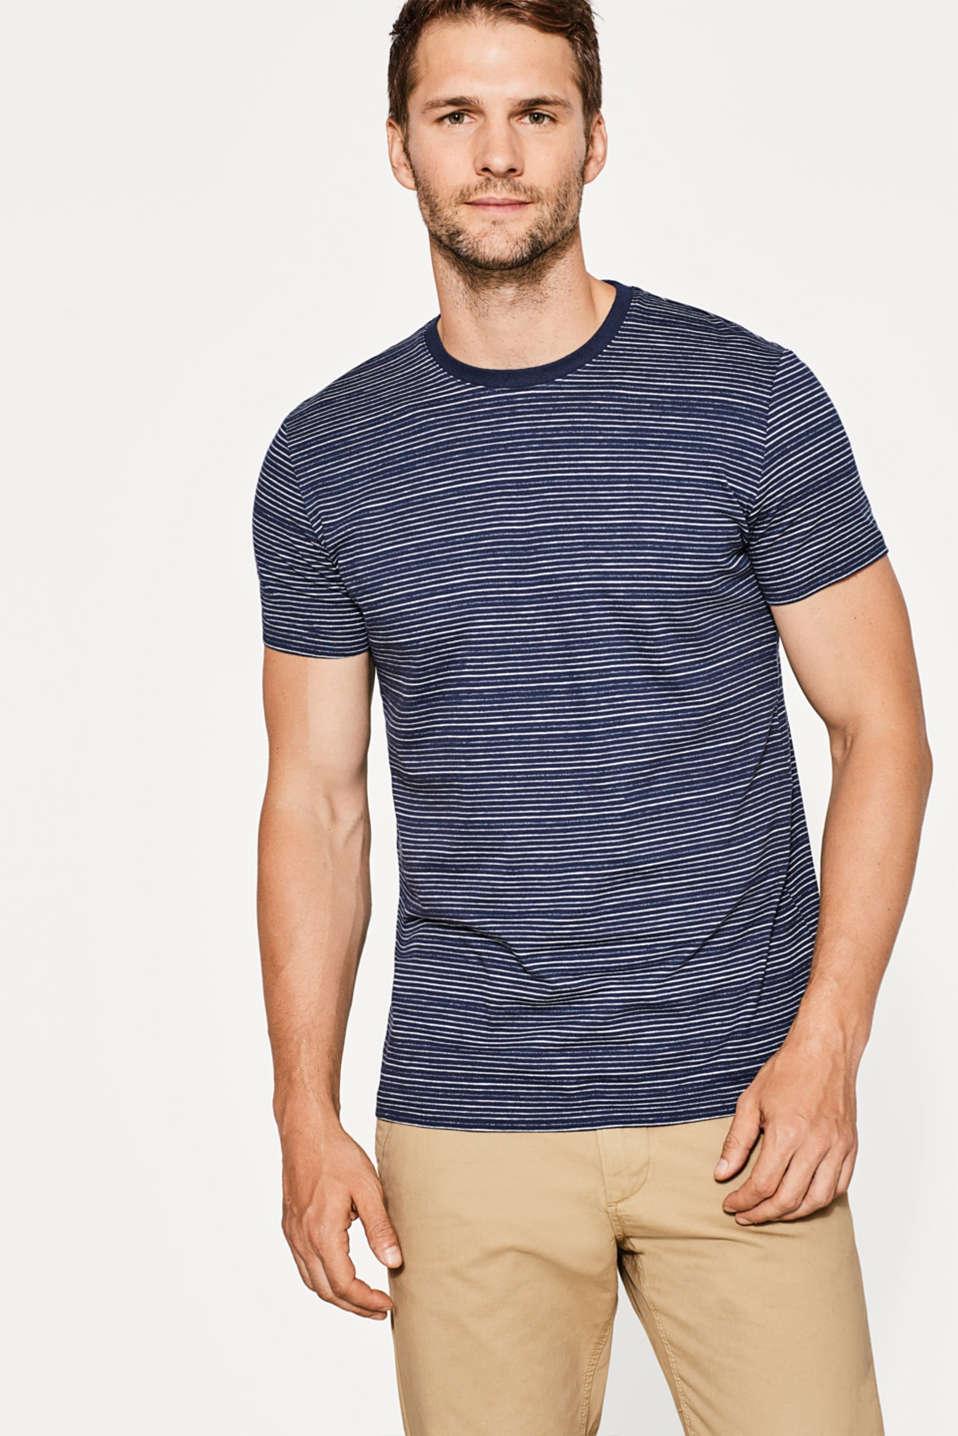 Esprit - Striped, cotton-jersey T-shirt